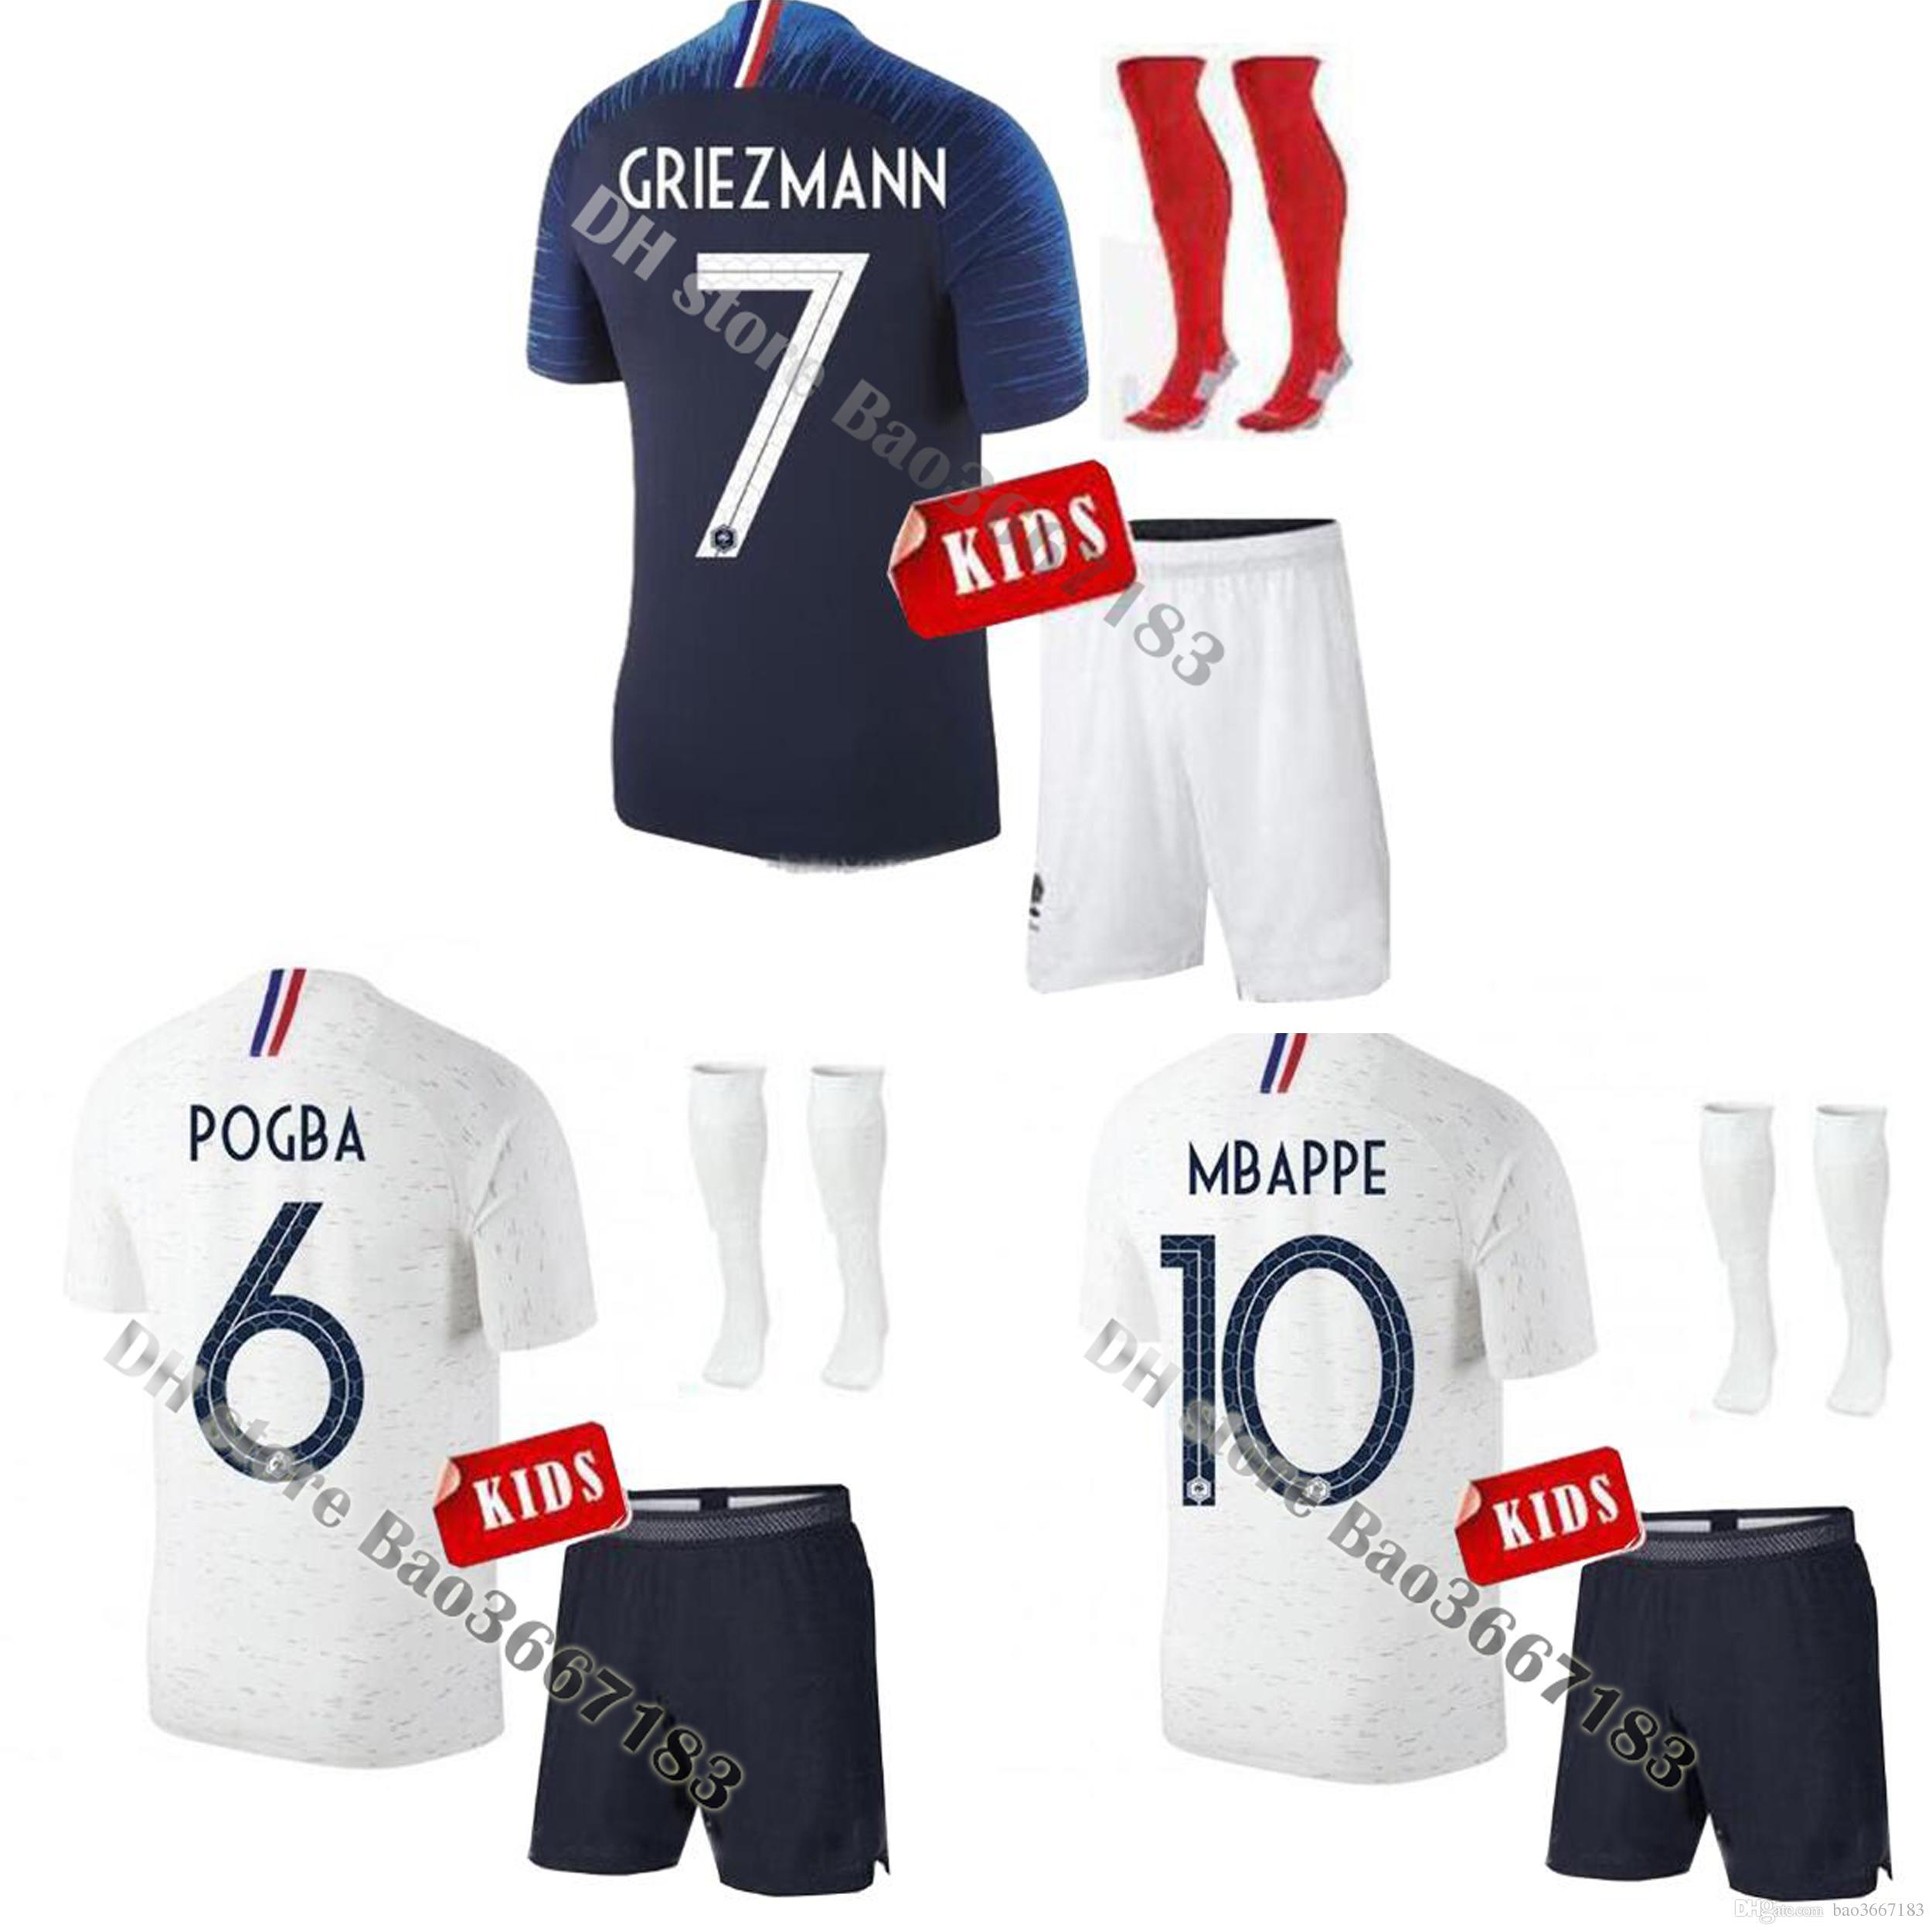 Kids 2018 World Cup New France Soccer Jerseys Kids Kit MBAPPE POGBA  GRIEZMANN GIROUD KANTE 2018 France Football Shirt Children 2018 World Cup  France Soccer ...